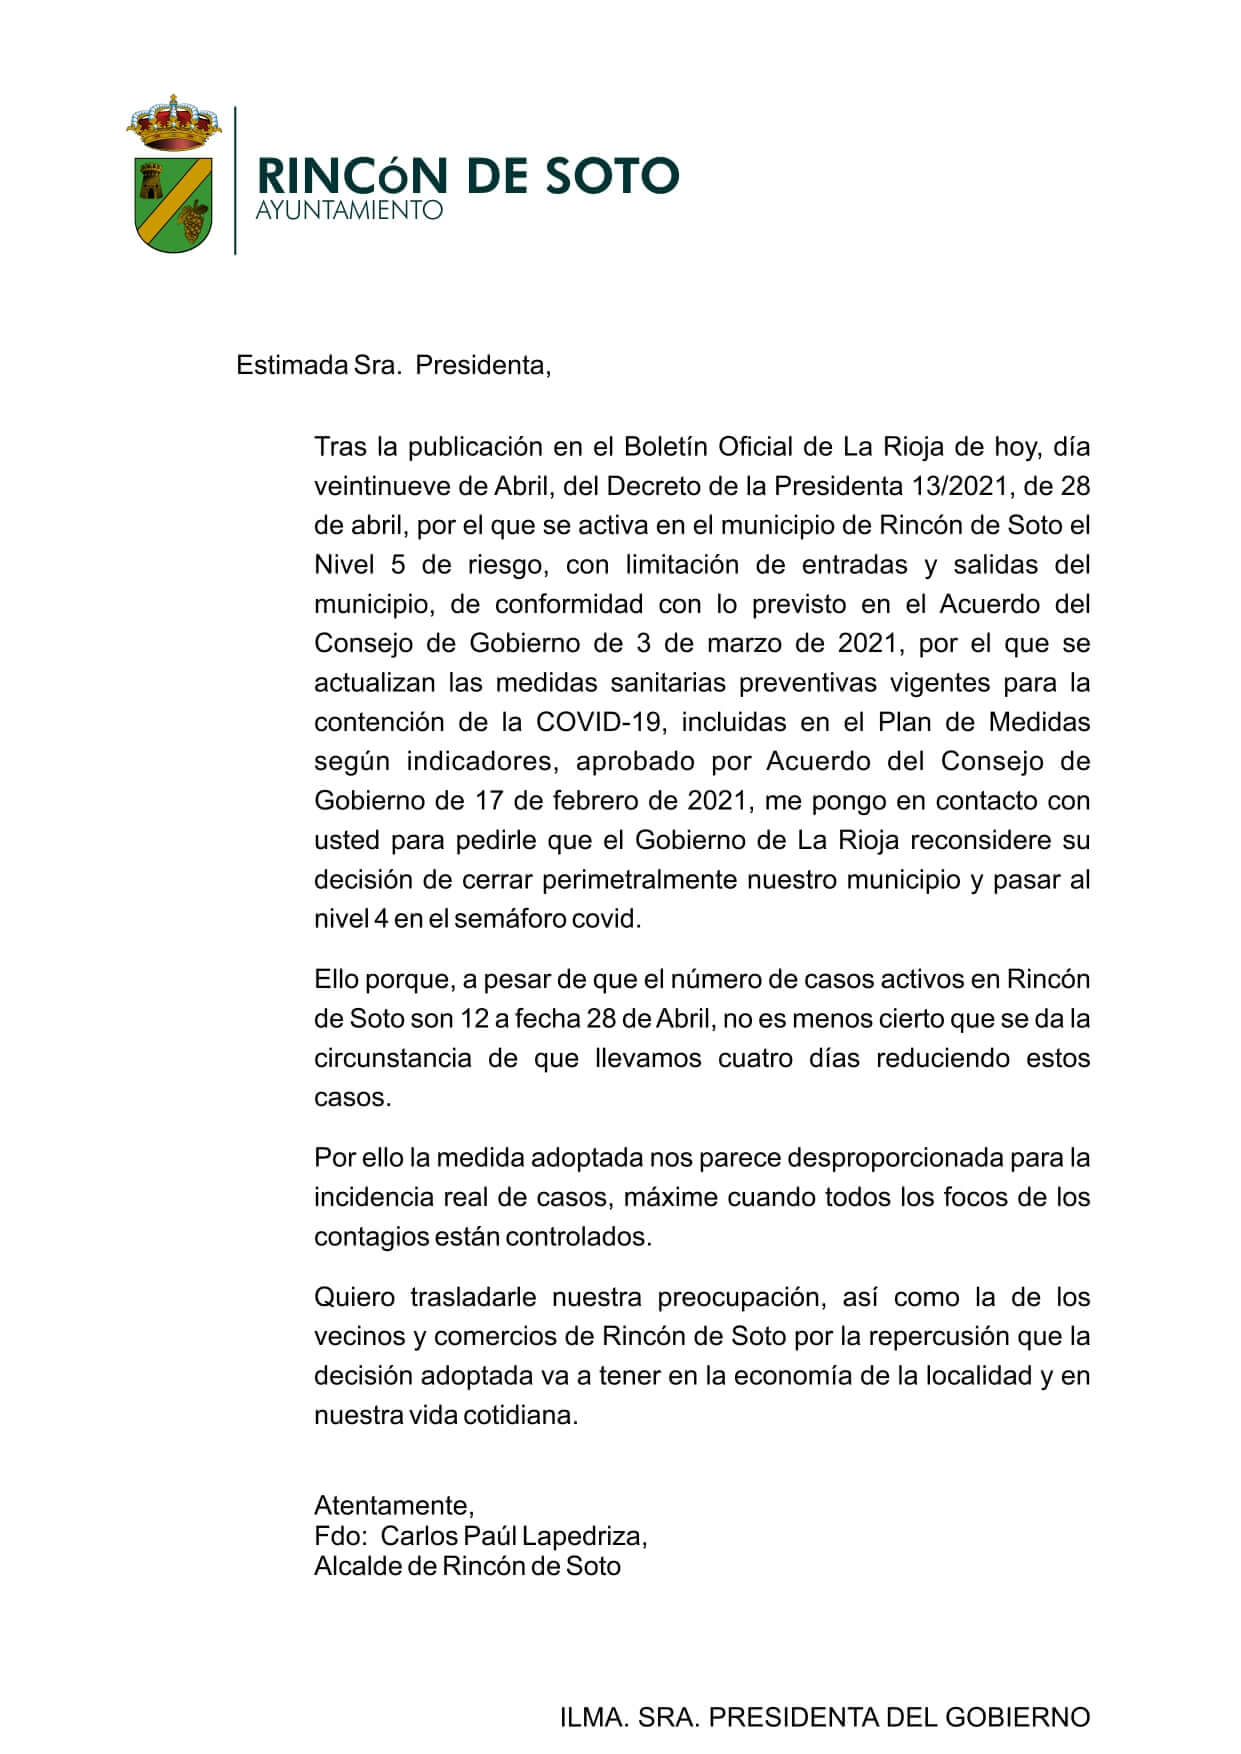 El alcalde de Rincón de Soto pide a la presidenta Andreu que vuelva a situar a esta localidad en el nivel 4 del Plan de Medidas según Indicadores